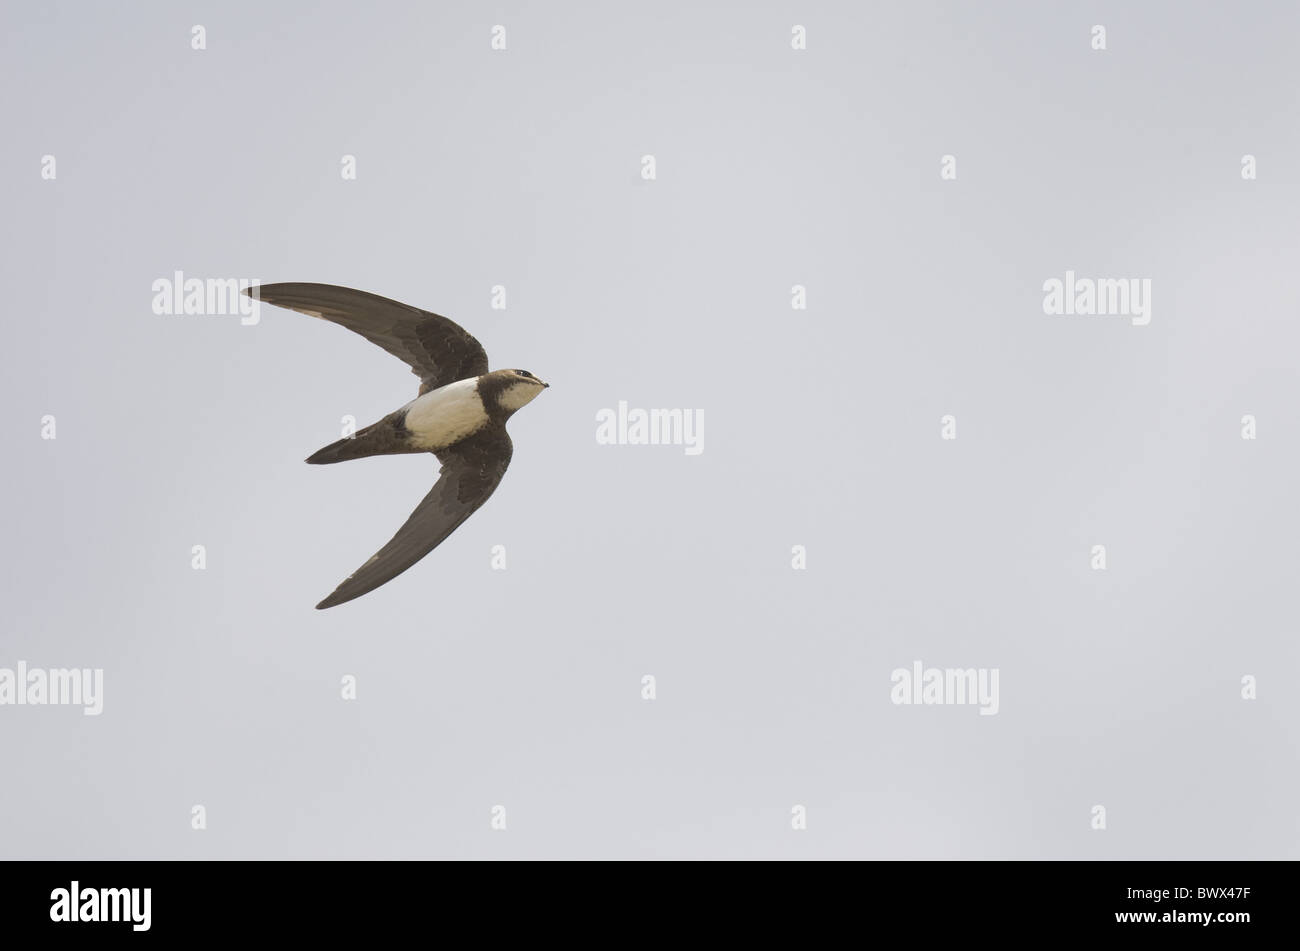 Alpine Swift (Apus melba) adult, in flight, on migration, Tarifa, Cadiz, Andalusia, Southern Spain, autumn Stock Photo